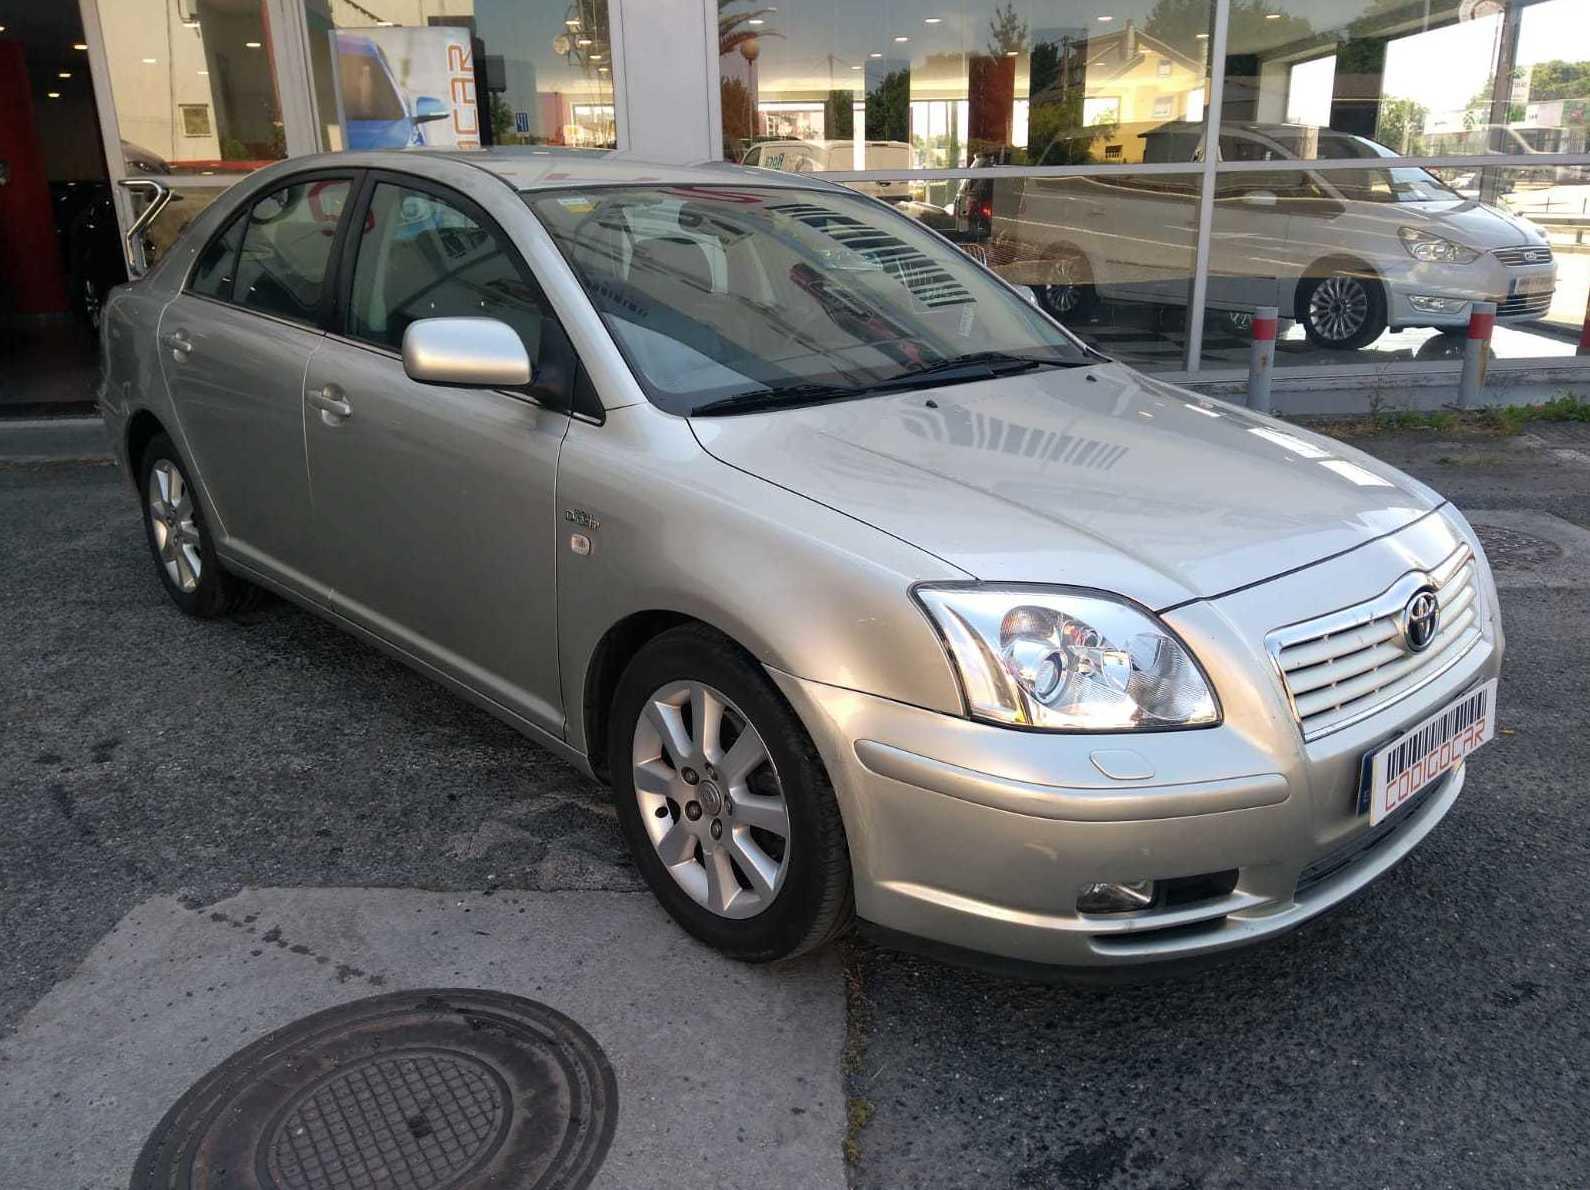 TOYOTA AVENSIS D-4D 177CV EXECUTIVE 5PUERTAS: Compra venta de coches de CODIGOCAR